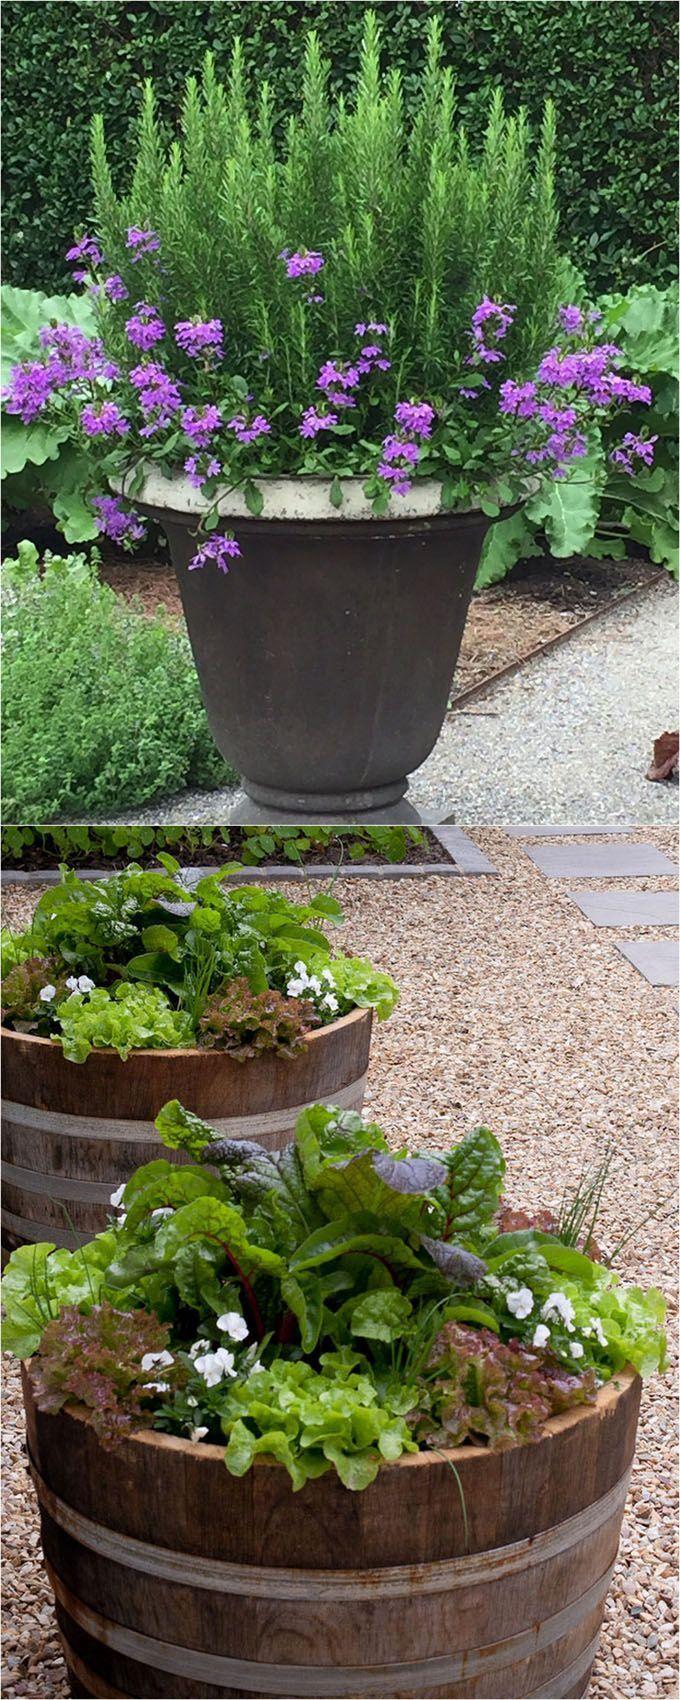 De 20 bedste id er inden for blomsterkrukker p pinterest for Perennial container garden designs